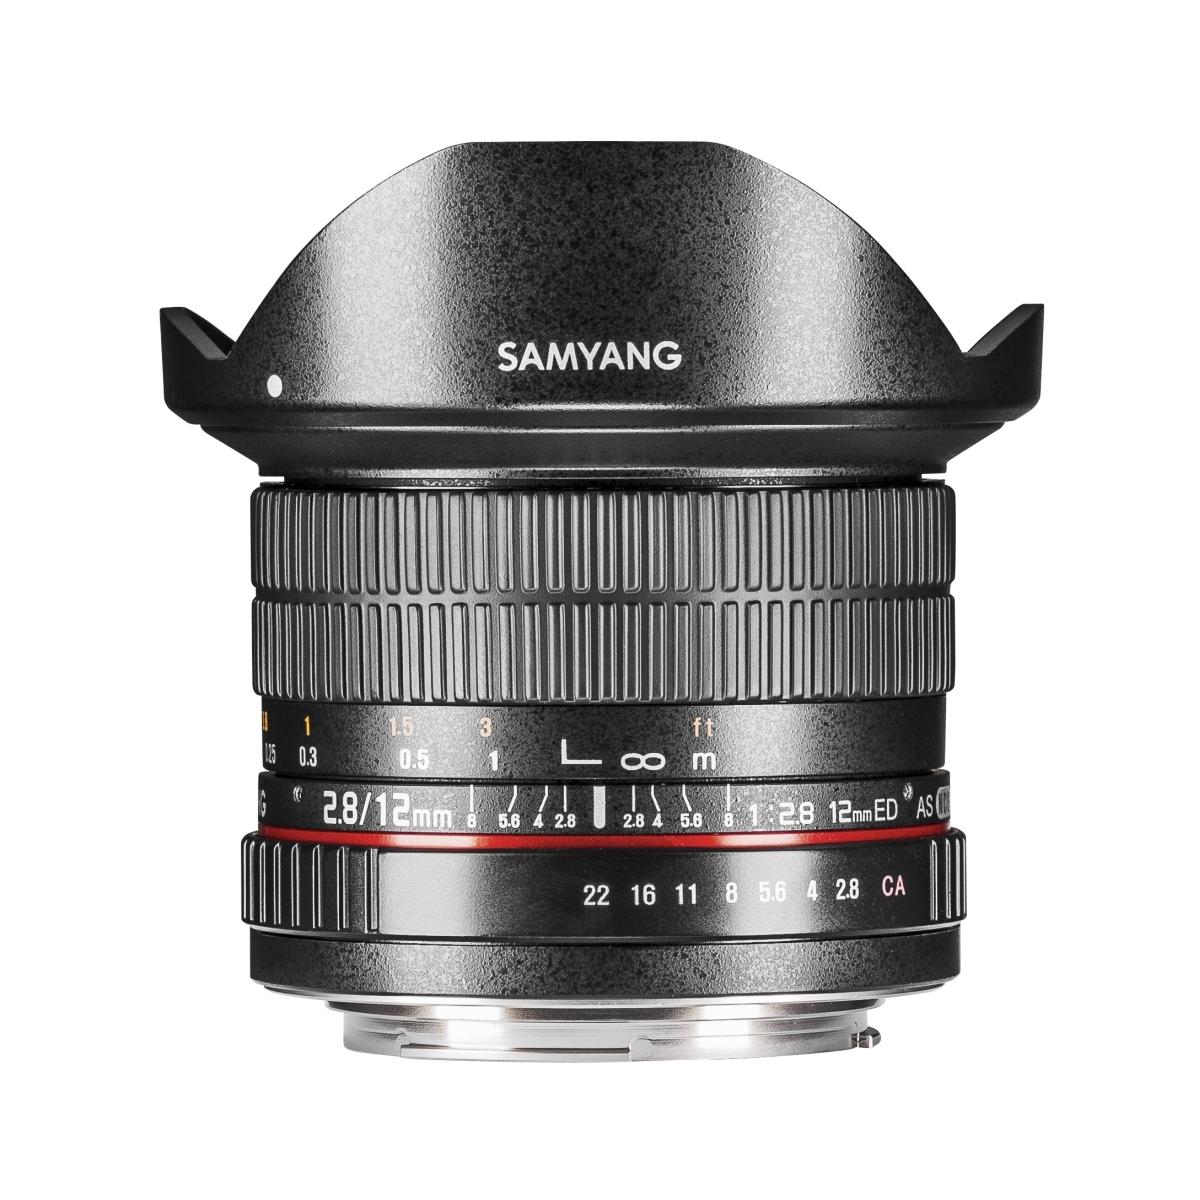 Samyang MF 12 mm 1:2,8 Fisheye für Pentax K